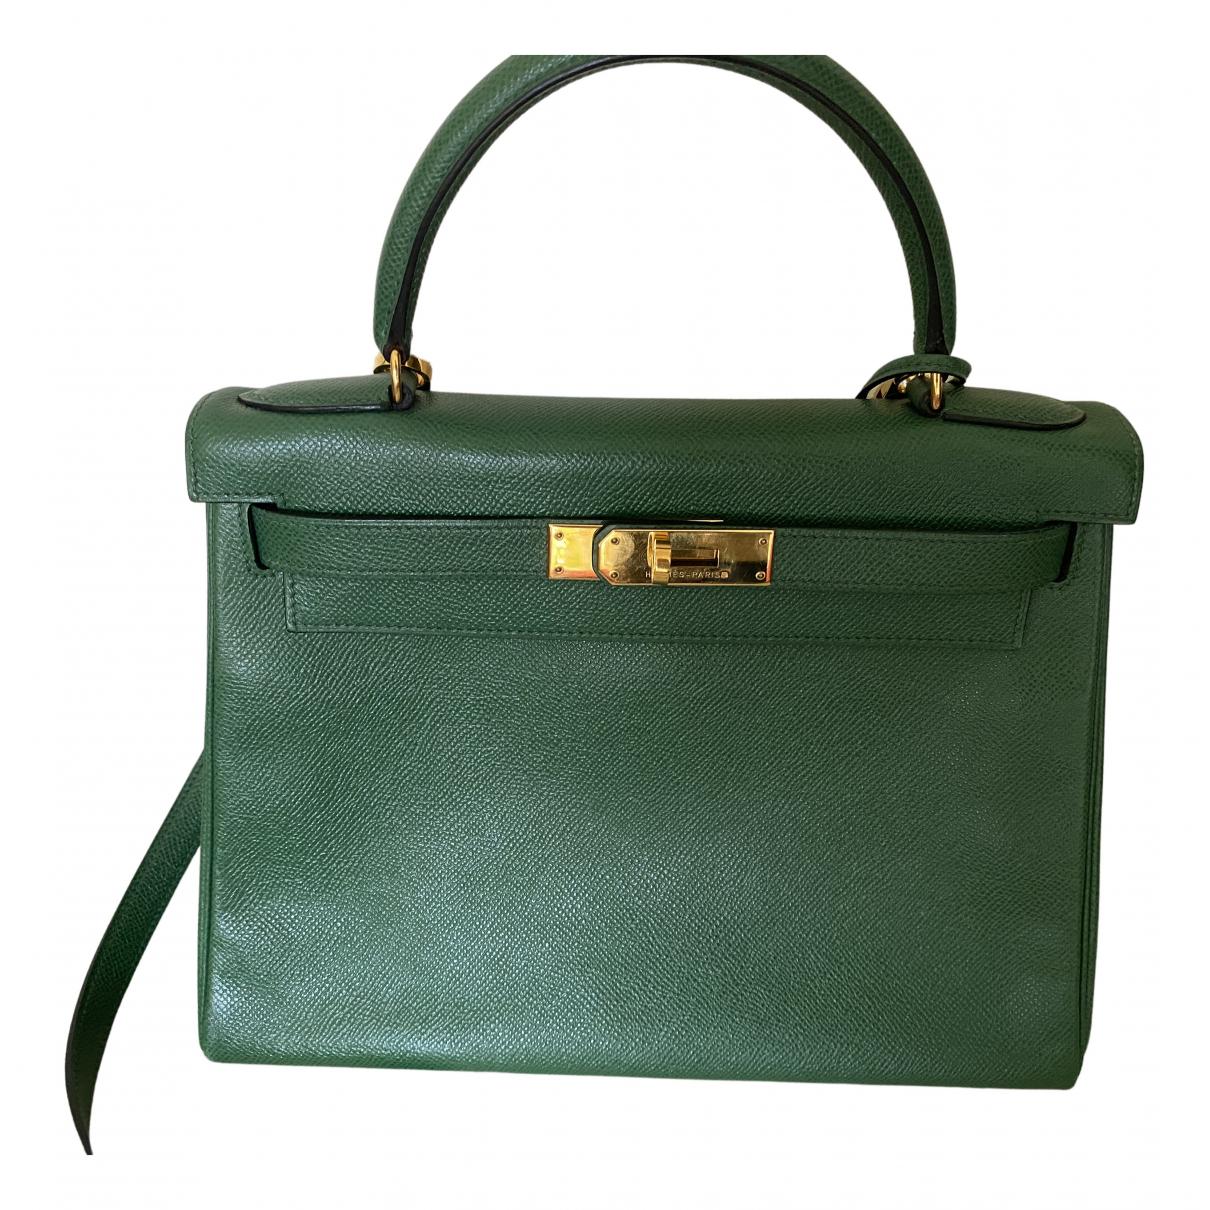 Hermes - Sac a main Kelly 28 pour femme en cuir - vert